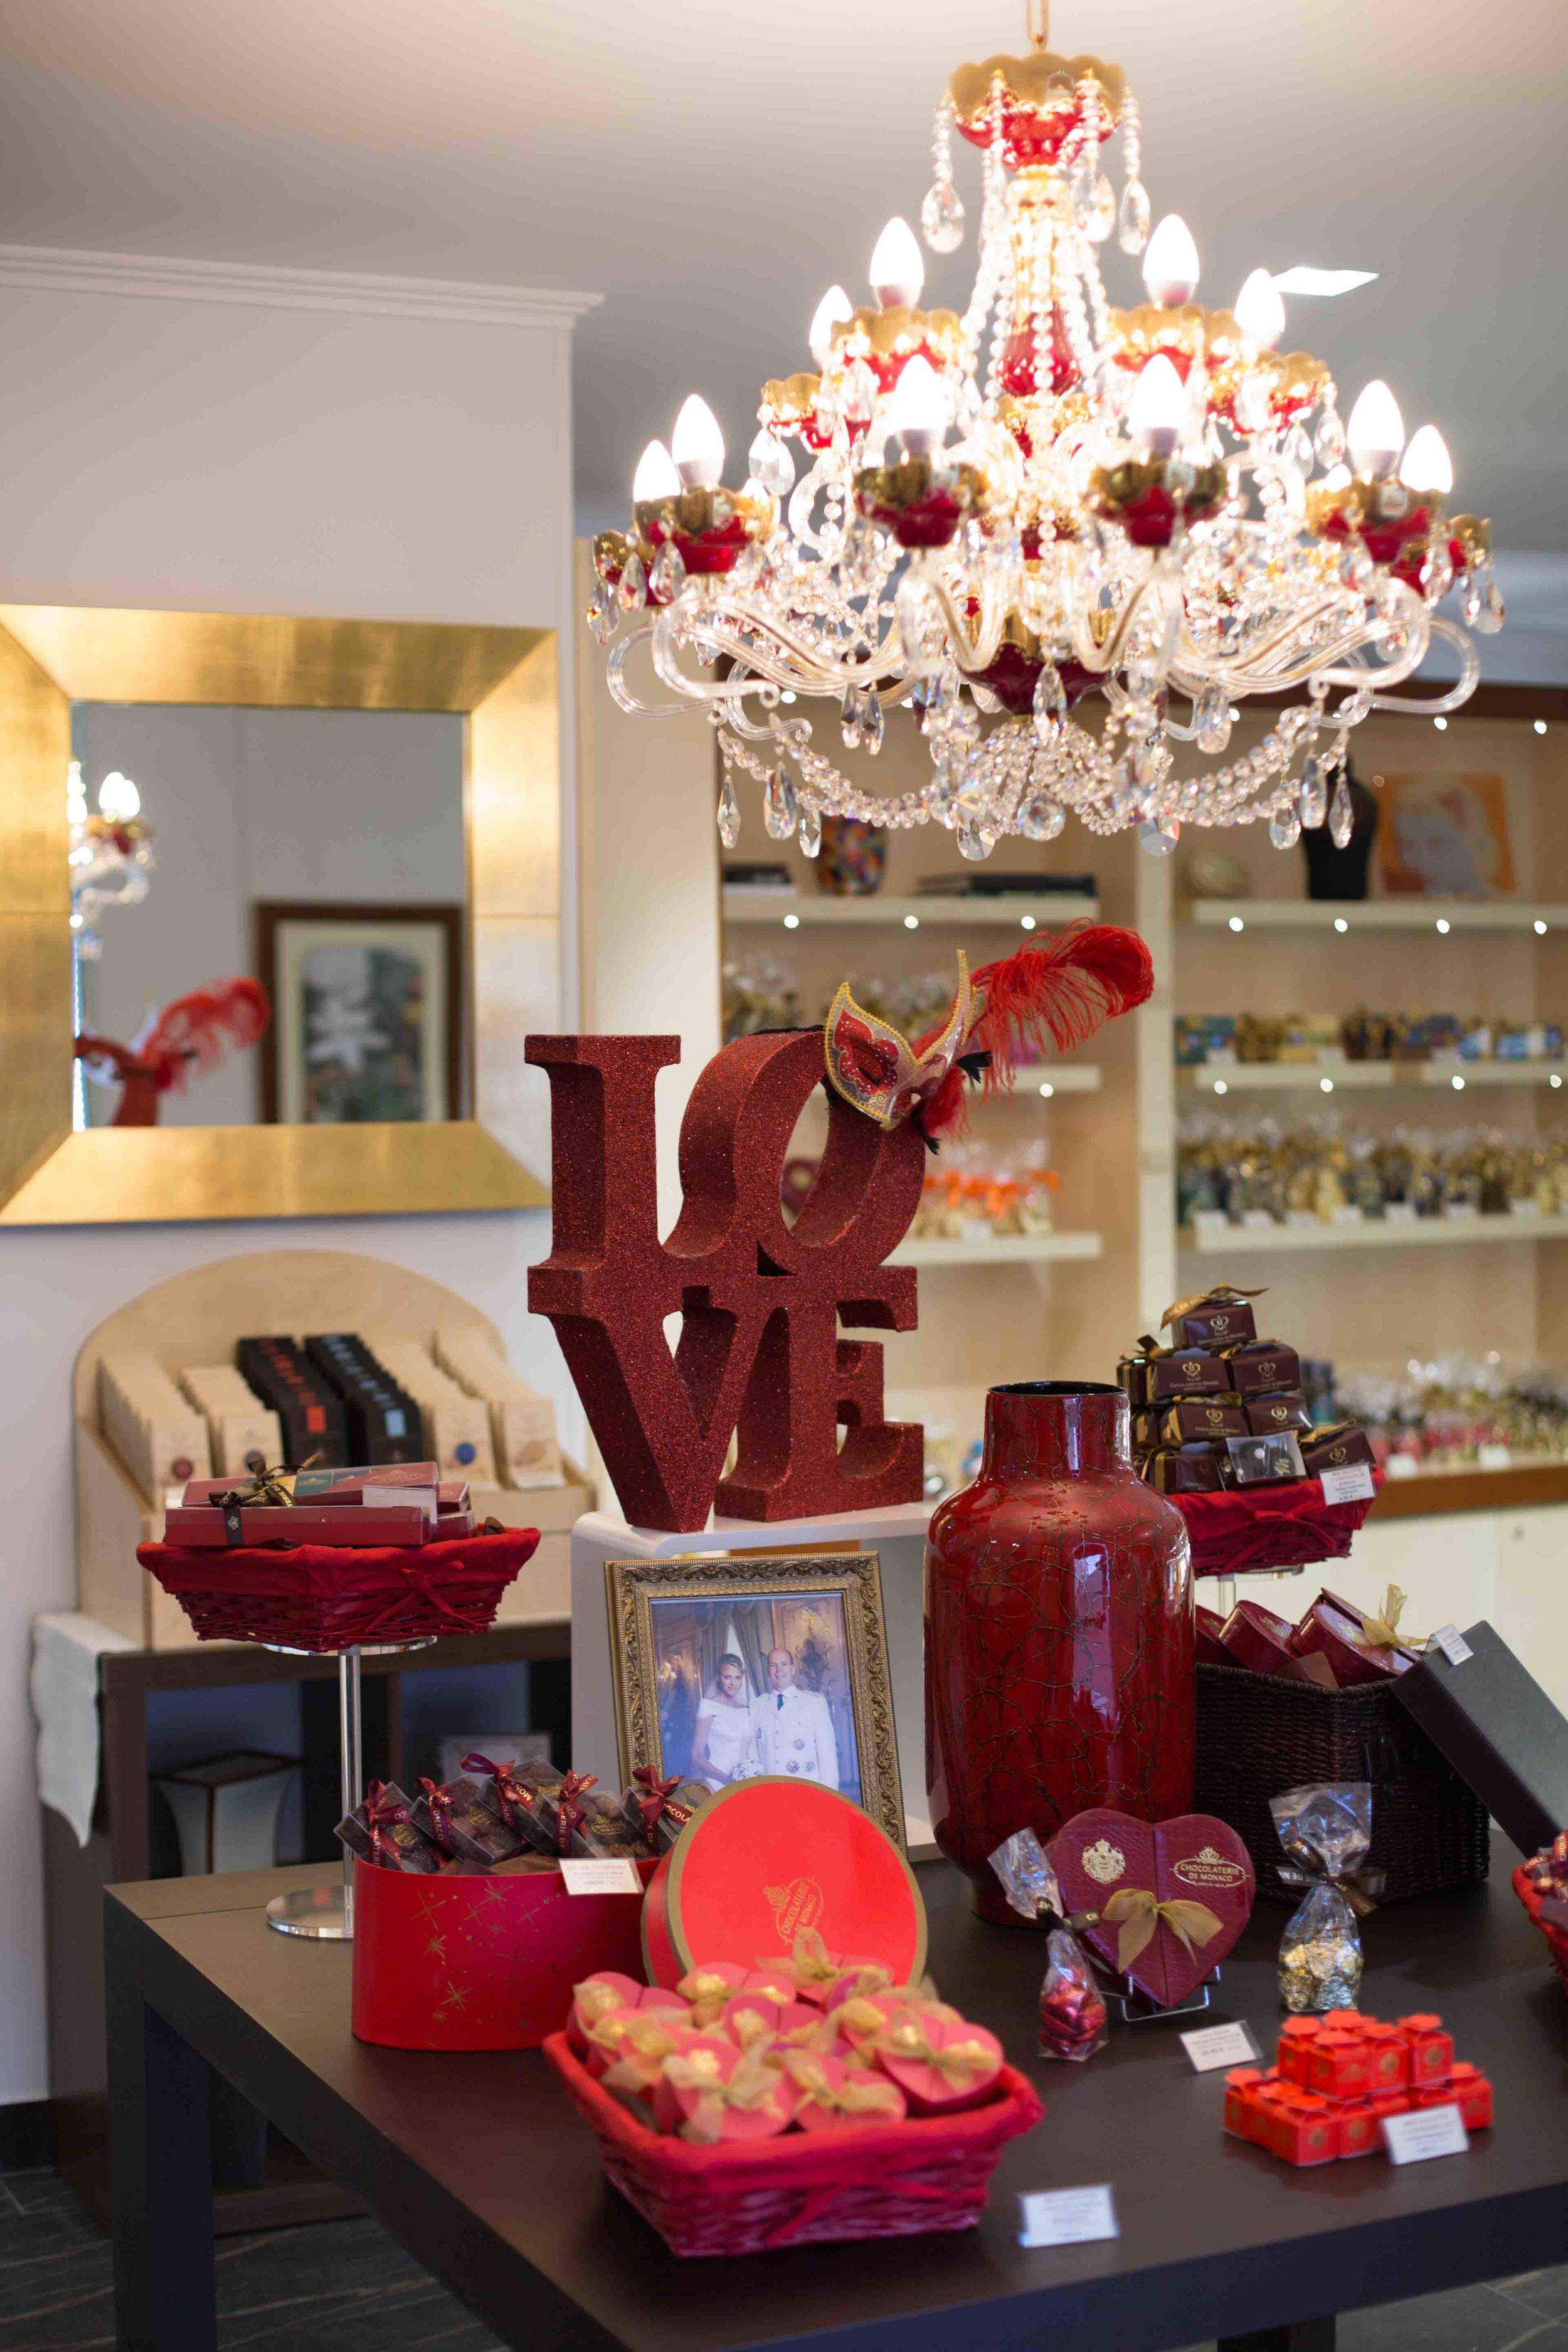 chocolaterie-de-monaco-wranovsky-crystal-chandelier-2.jpg